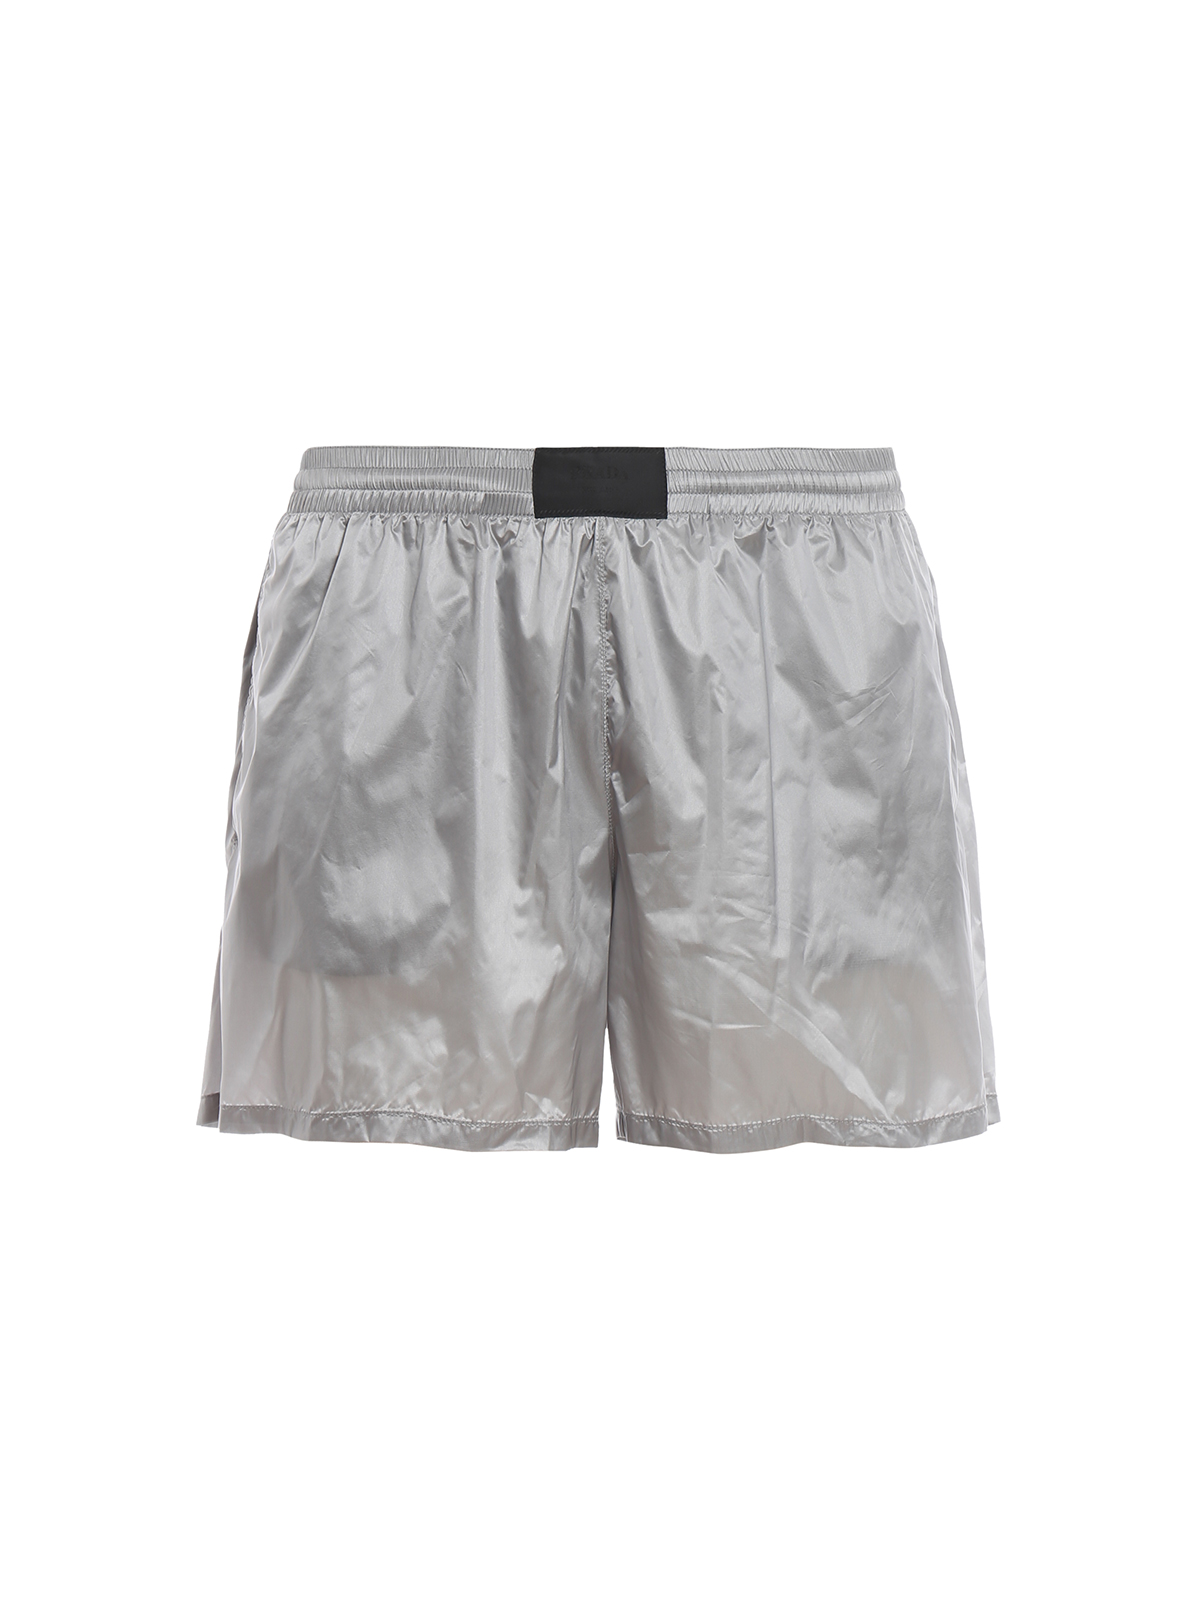 a9f60fd80a PRADA: Swim shorts & swimming trunks - Microristop nylon swim shorts